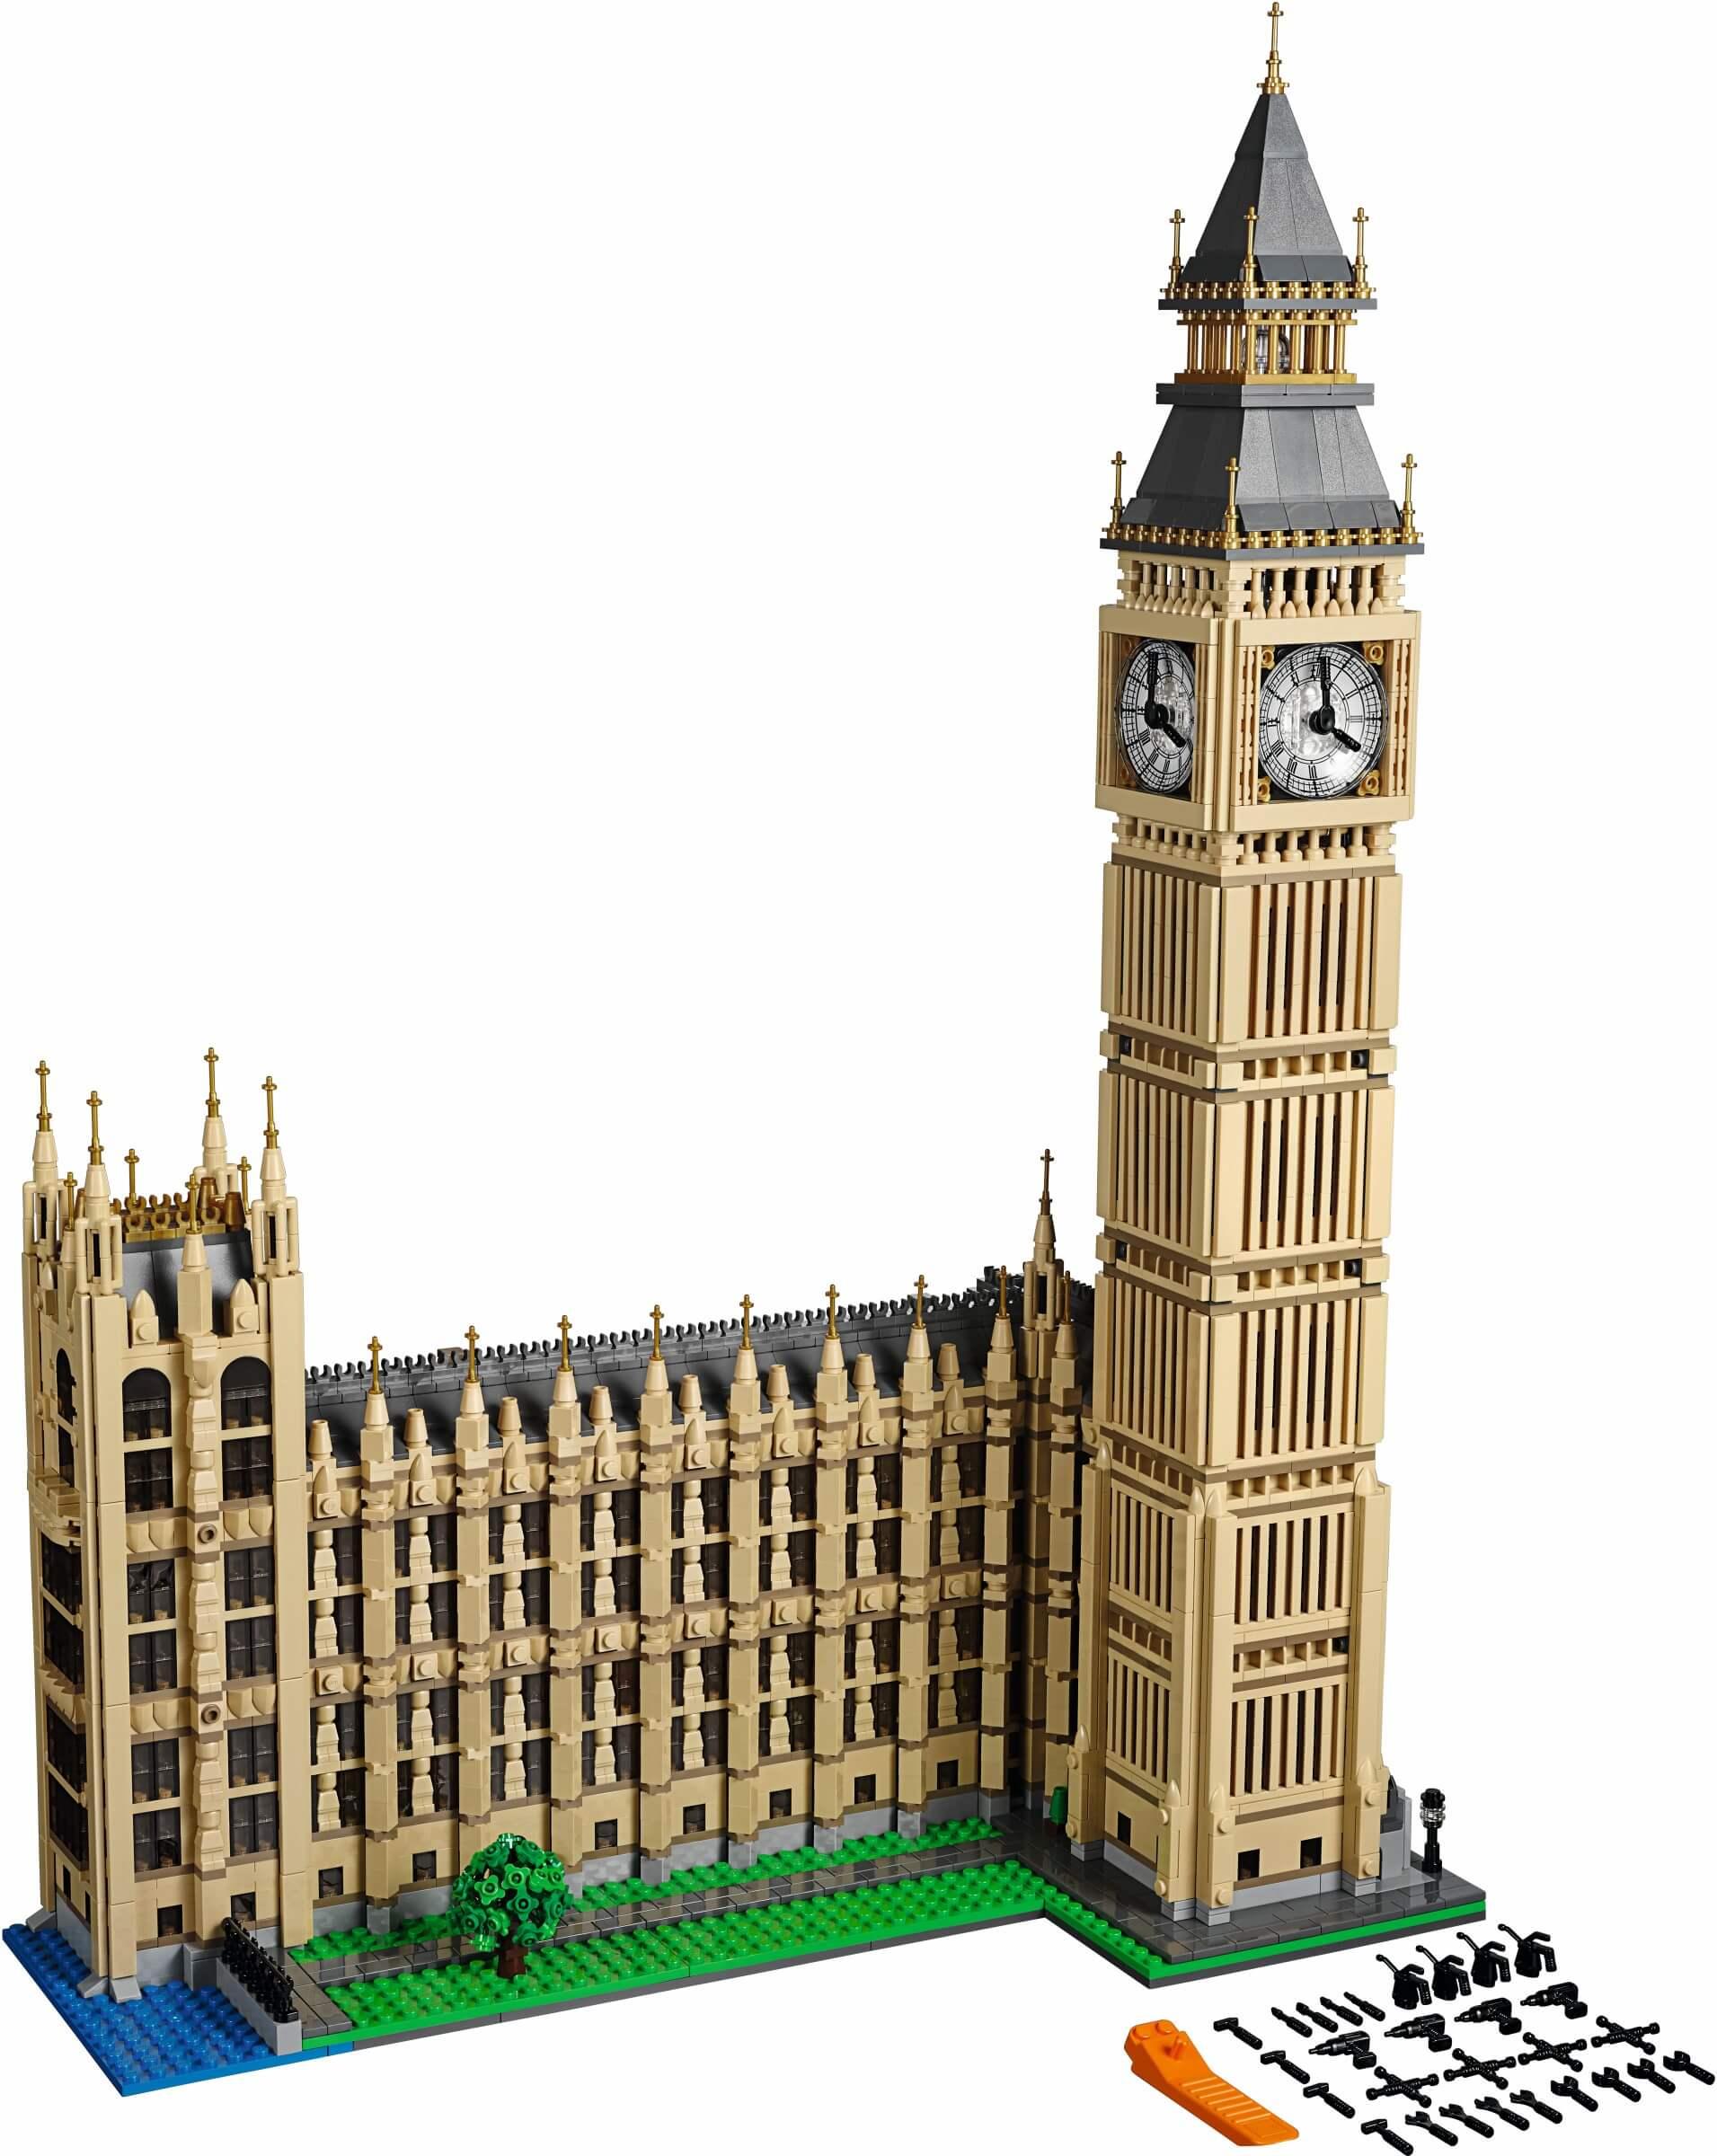 Mua đồ chơi LEGO 10253 - LEGO Creator 10253 - Tháp Đồng Hồ Big Ben (LEGO Creator Expert Big Ben 10253)